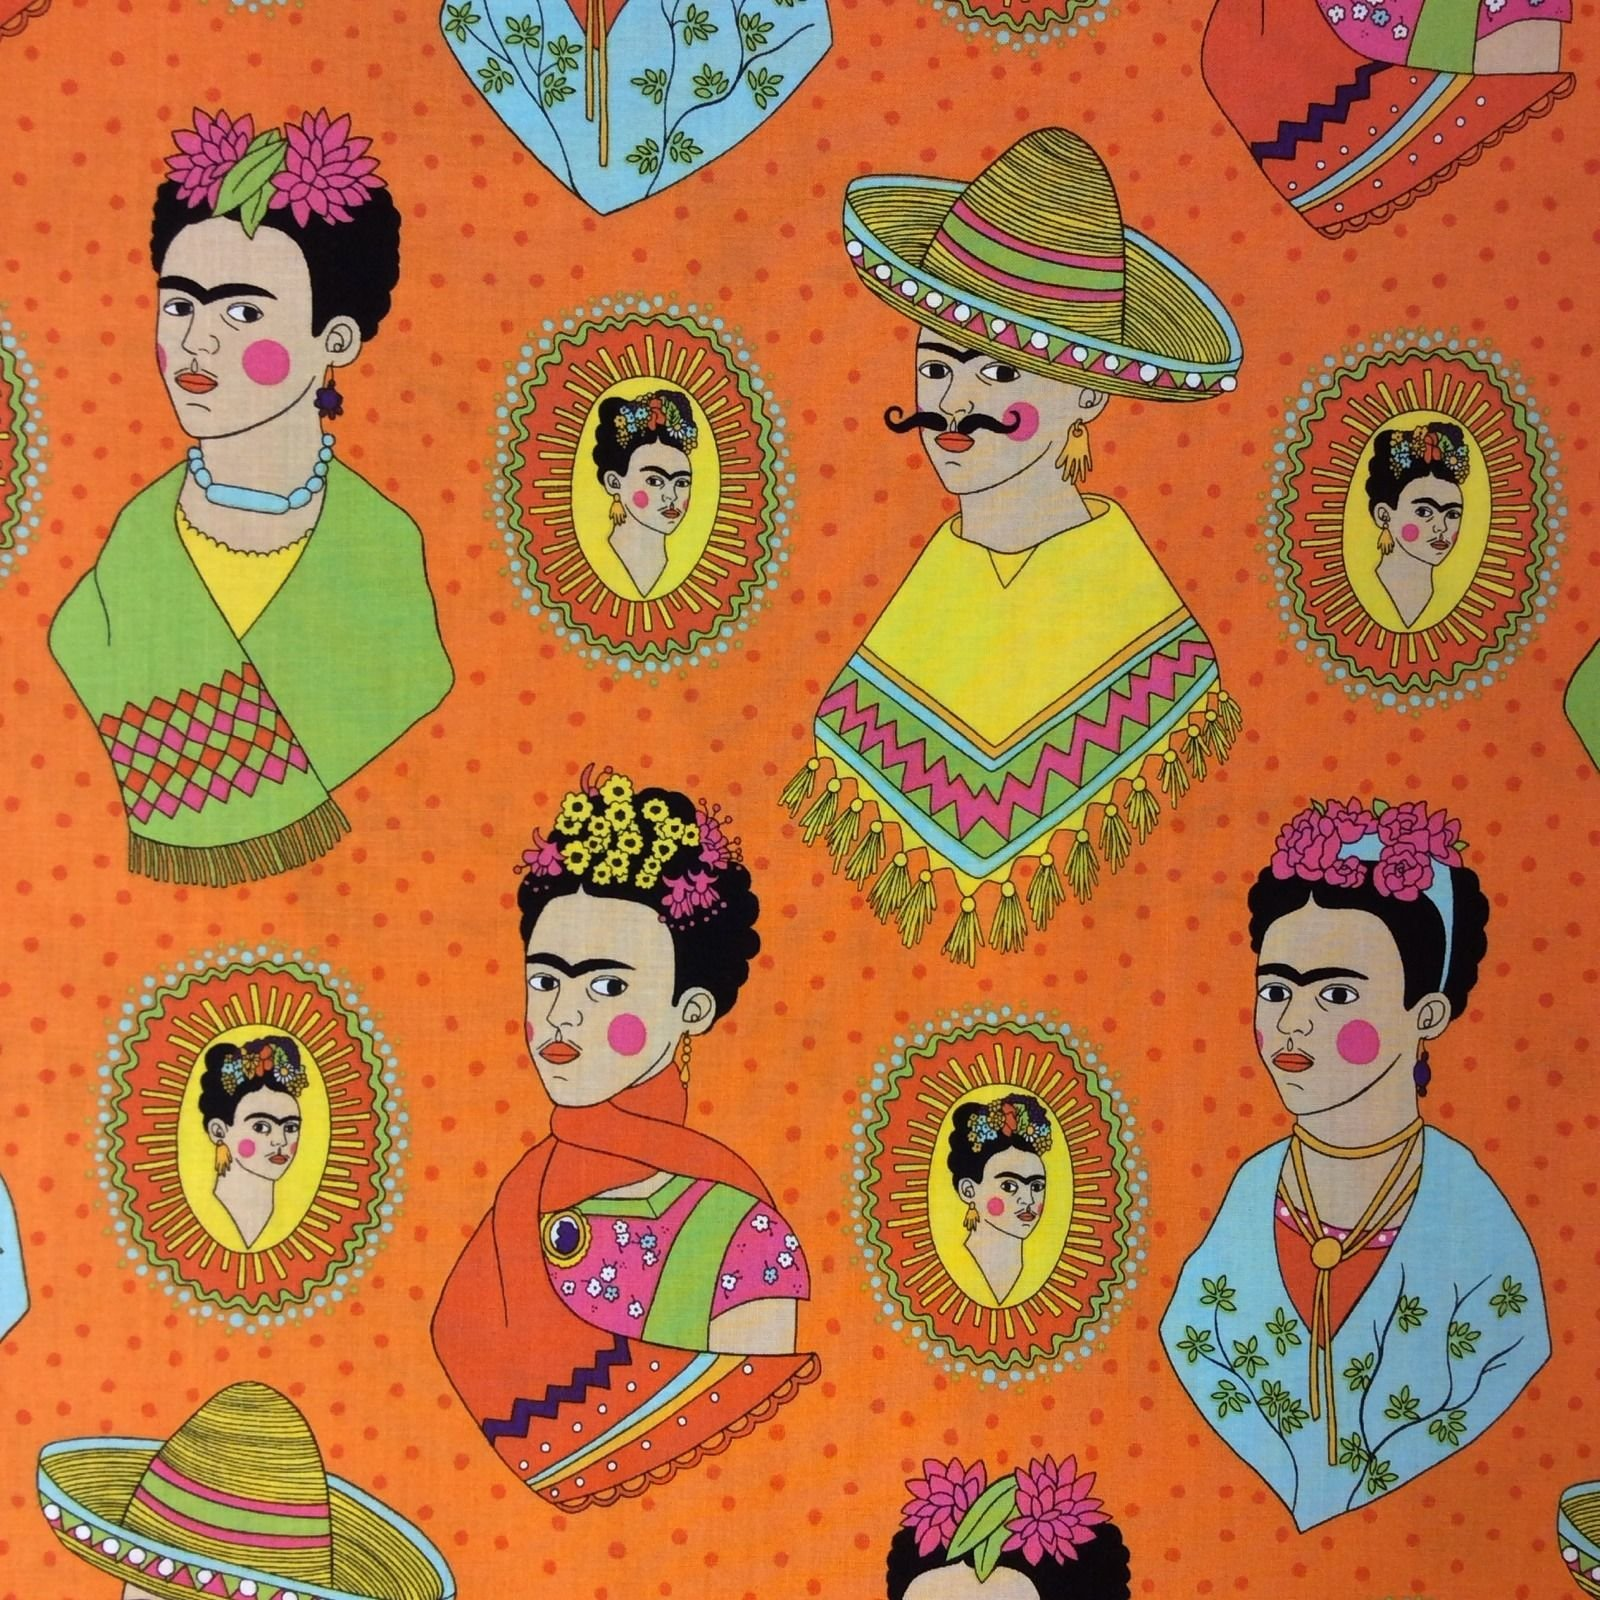 Frida Kahlo AH135 Mexican Frida Kahlo Sombrero Poncho Western ... : western quilting fabric - Adamdwight.com